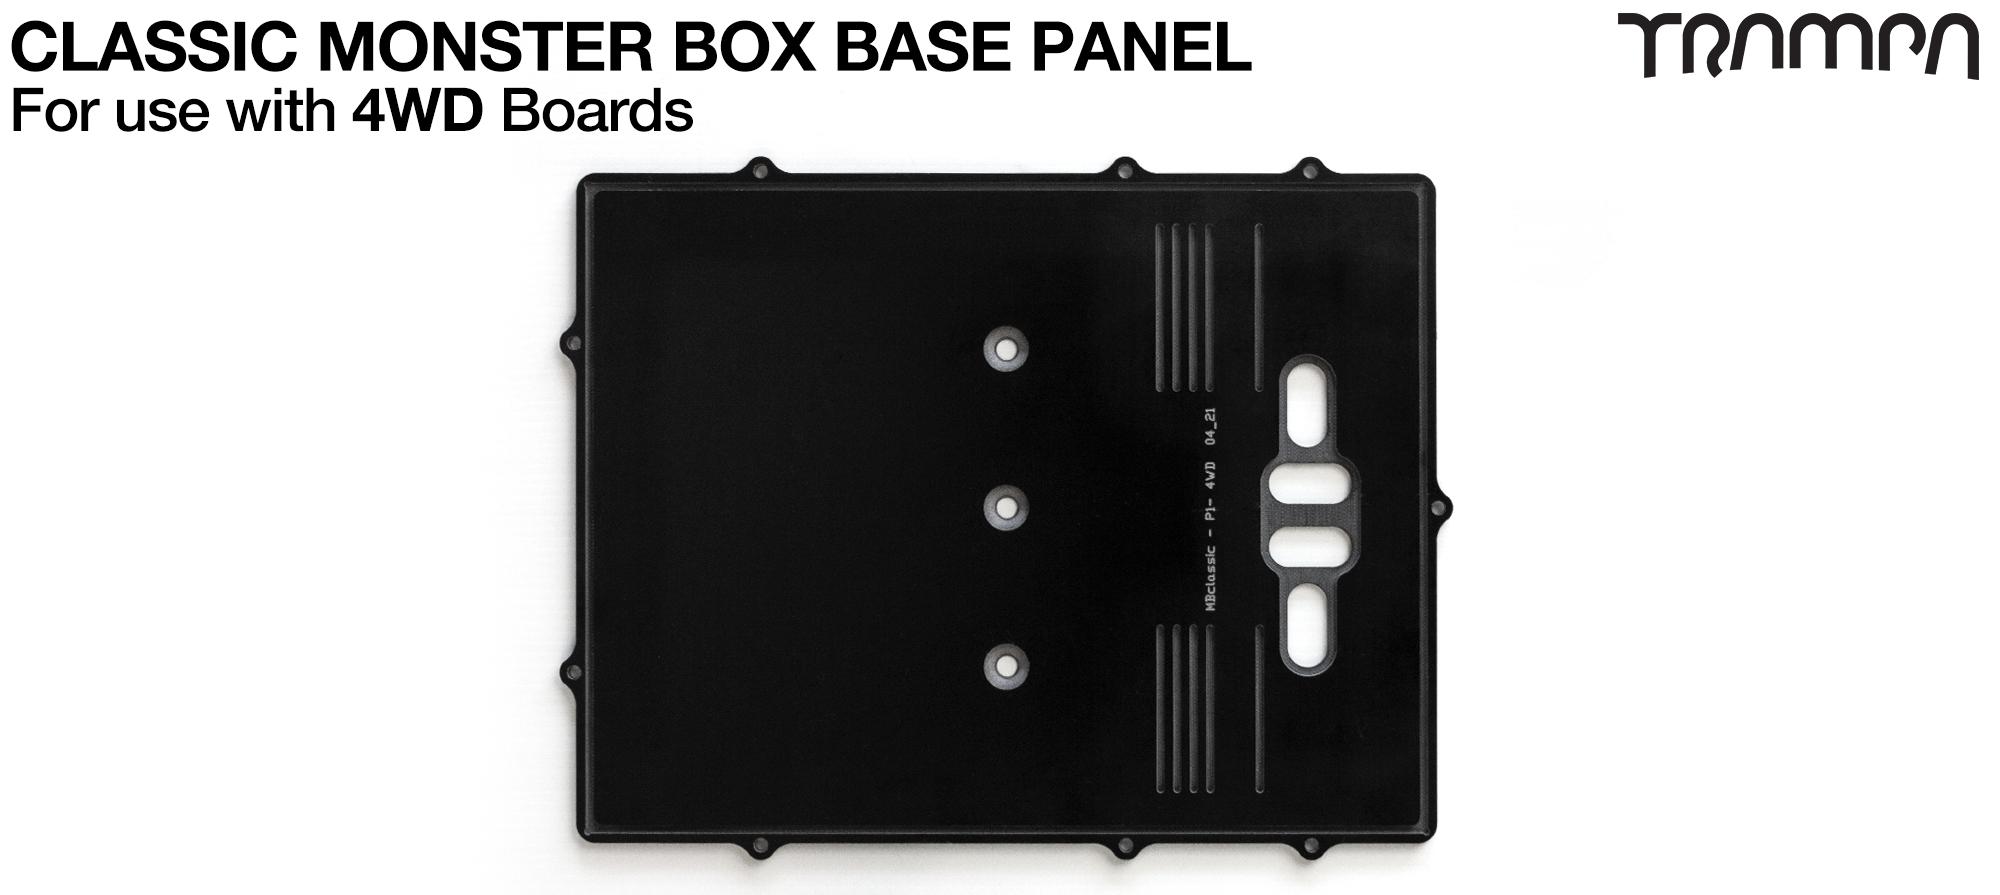 CLASSIC MONSTER Box MkV 4WD BASE